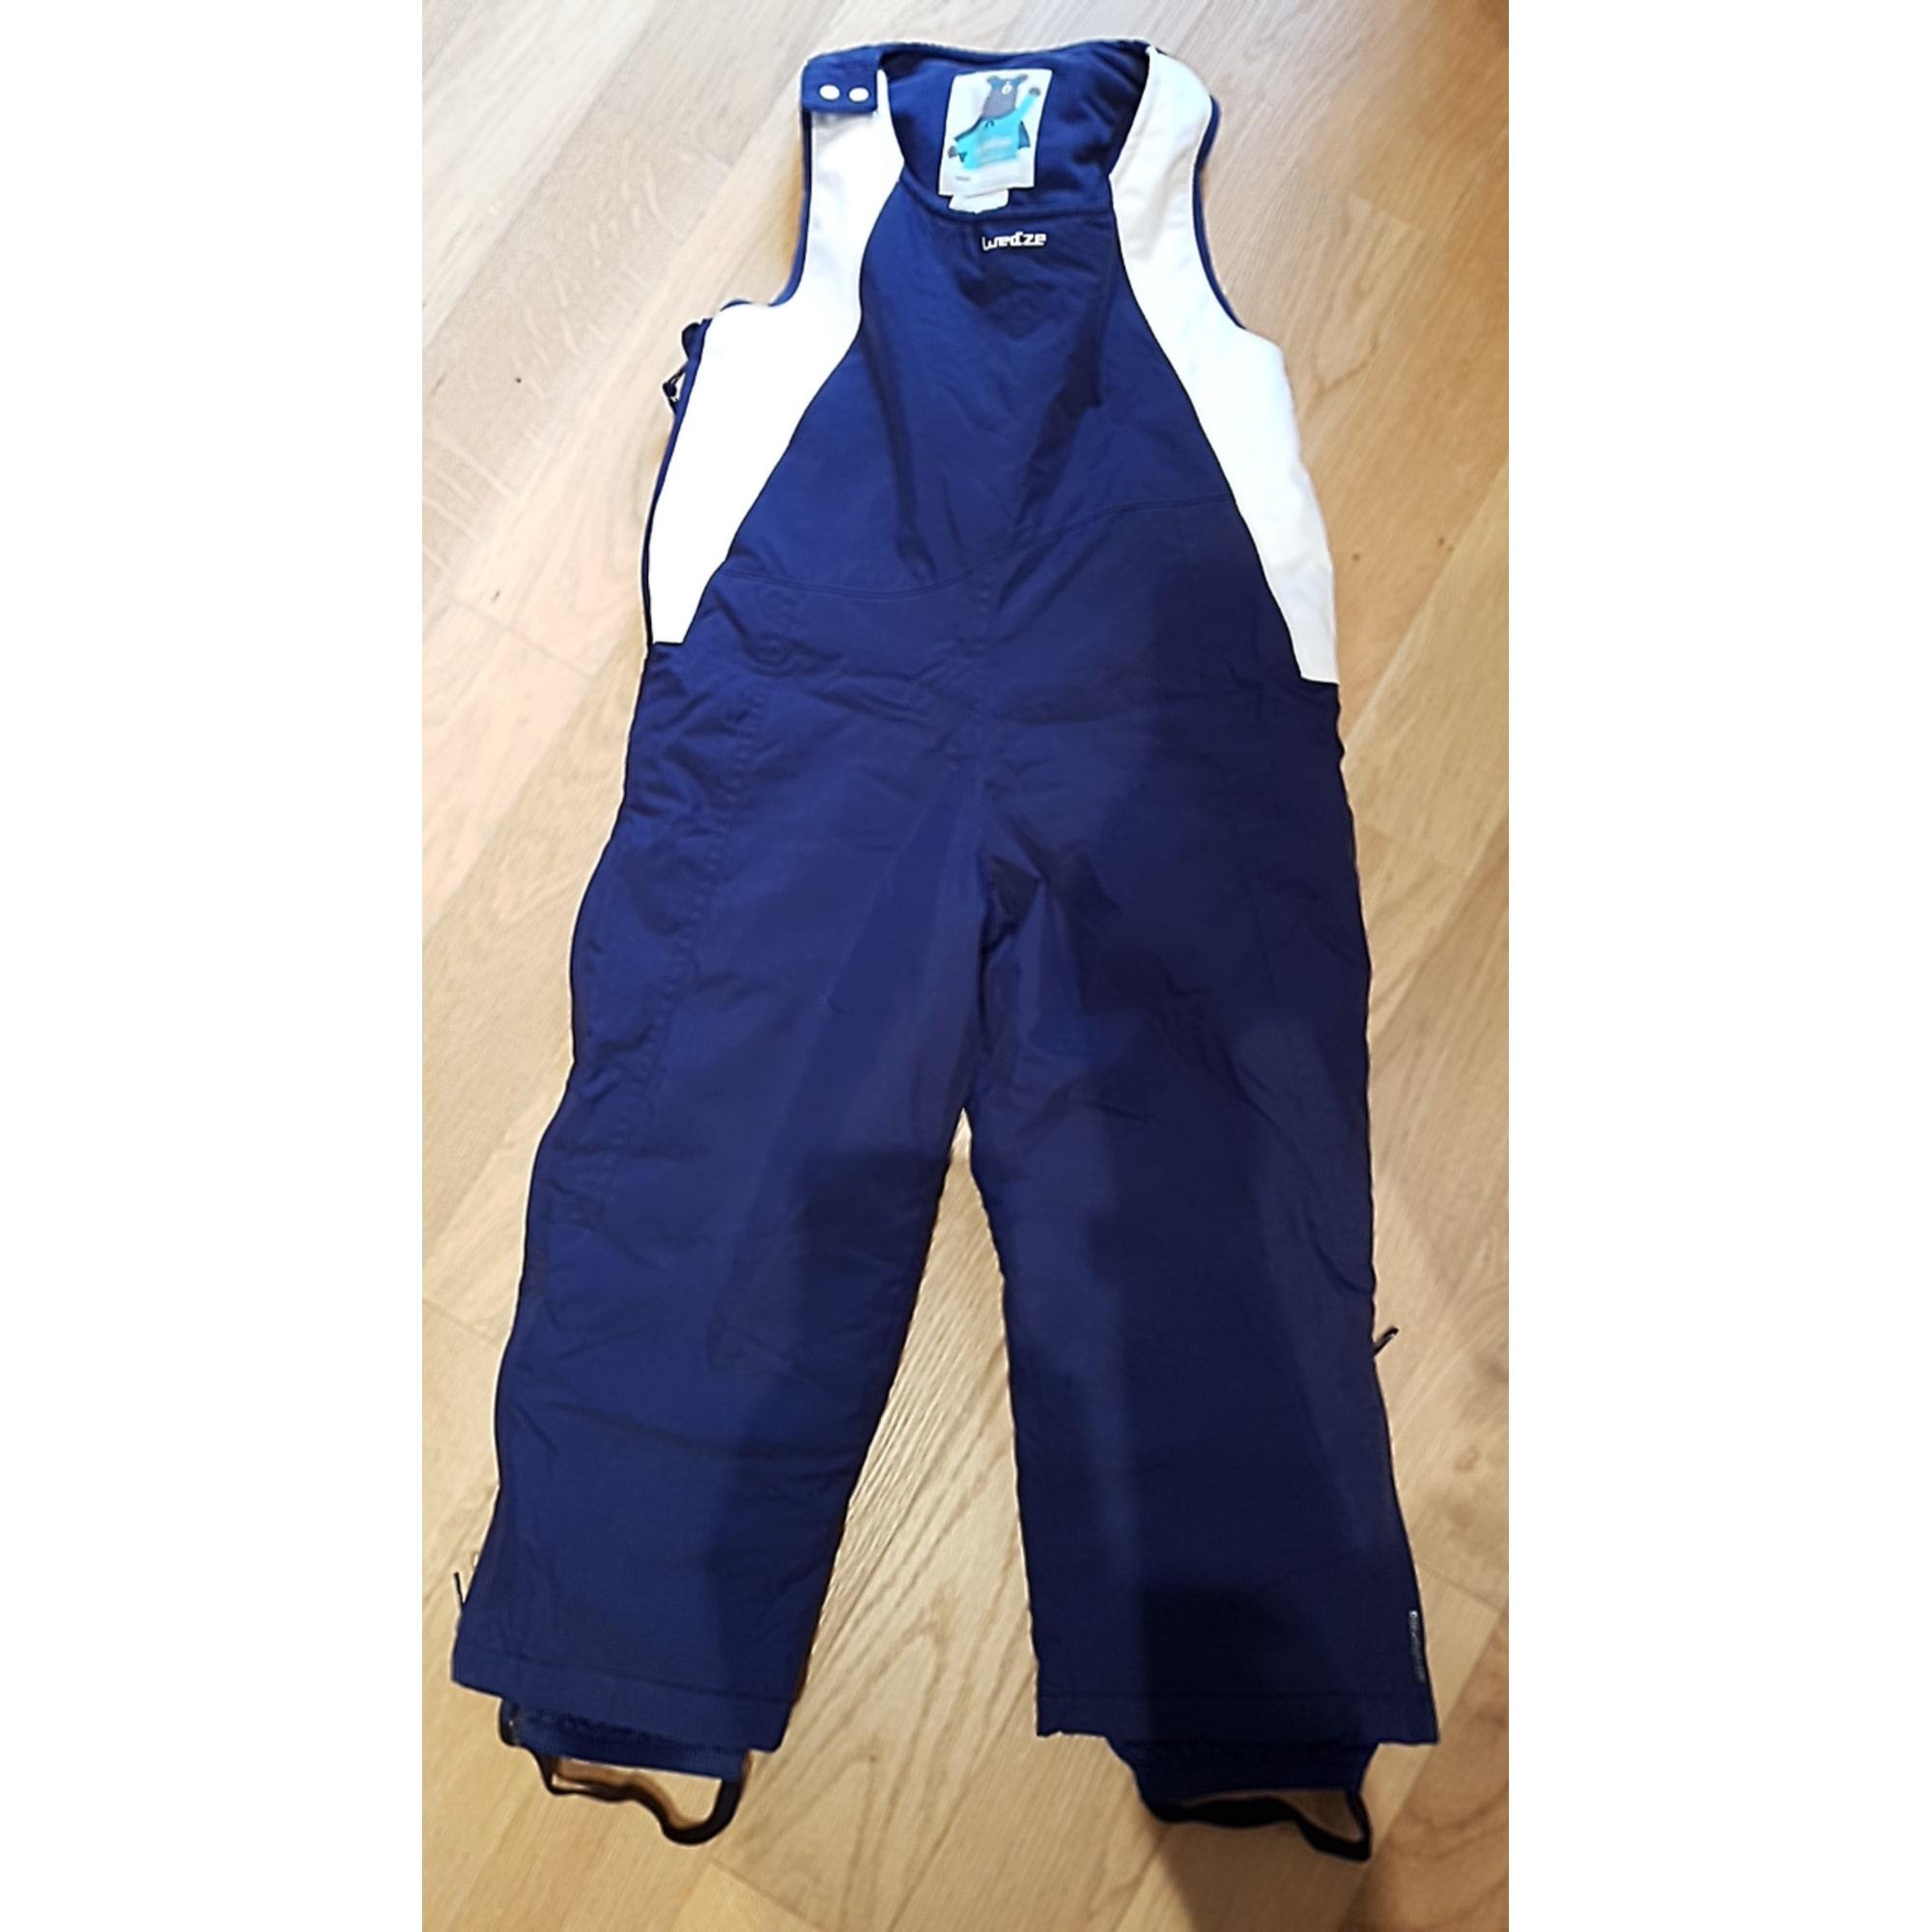 Pantalon De Ski Decathlon Autre Bleu 7790051